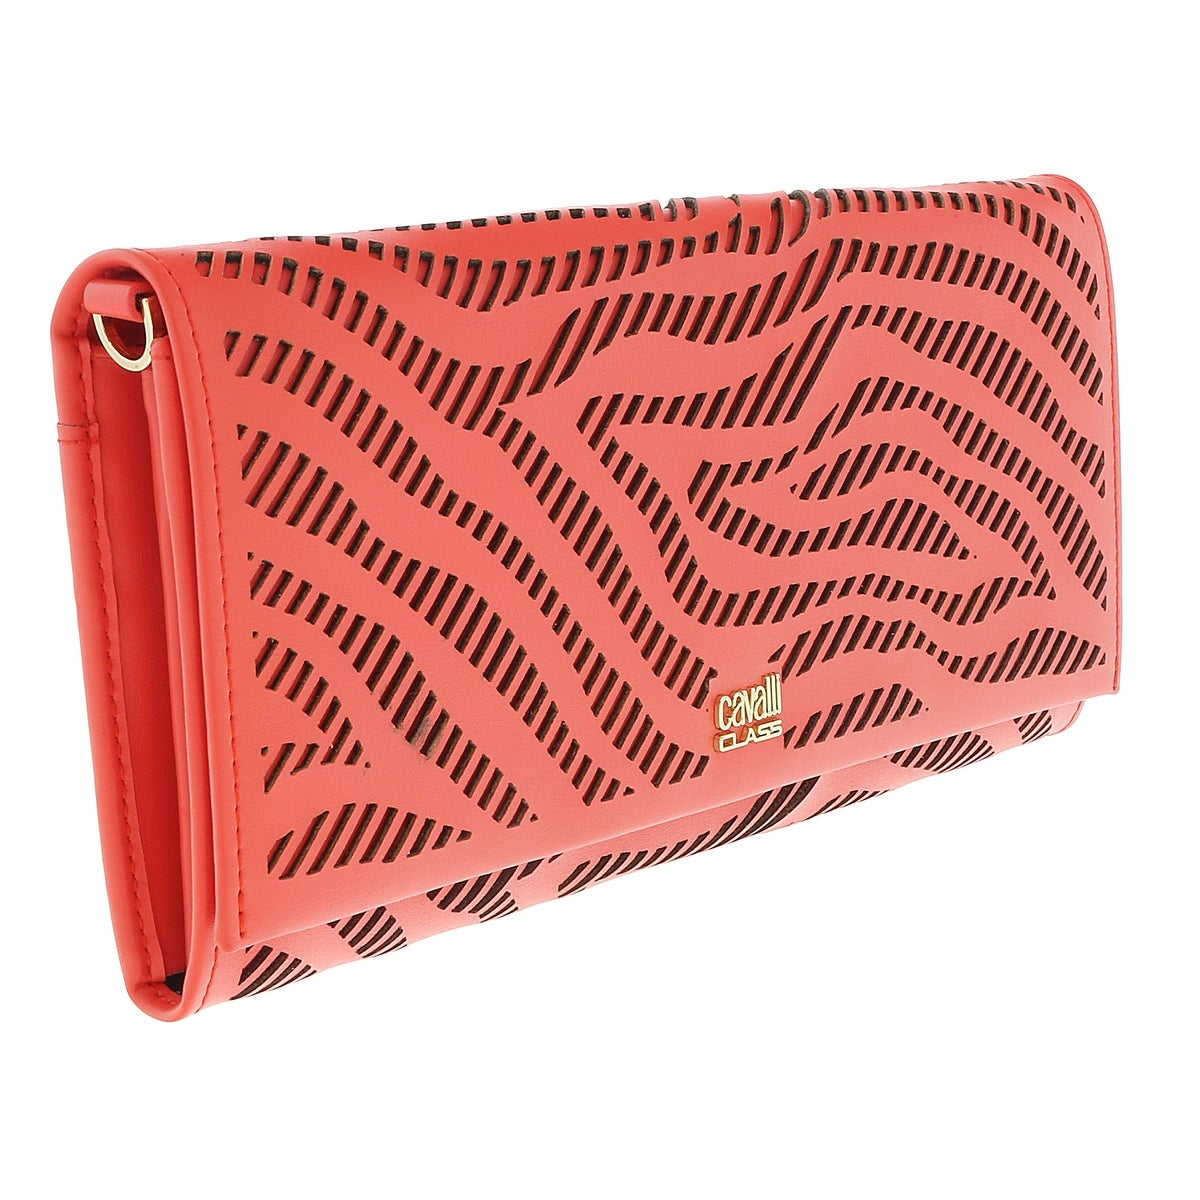 ee43a2686b7fc Buy Red Designer Wallets Online at Overstock   Our Best Designer  Accessories Deals